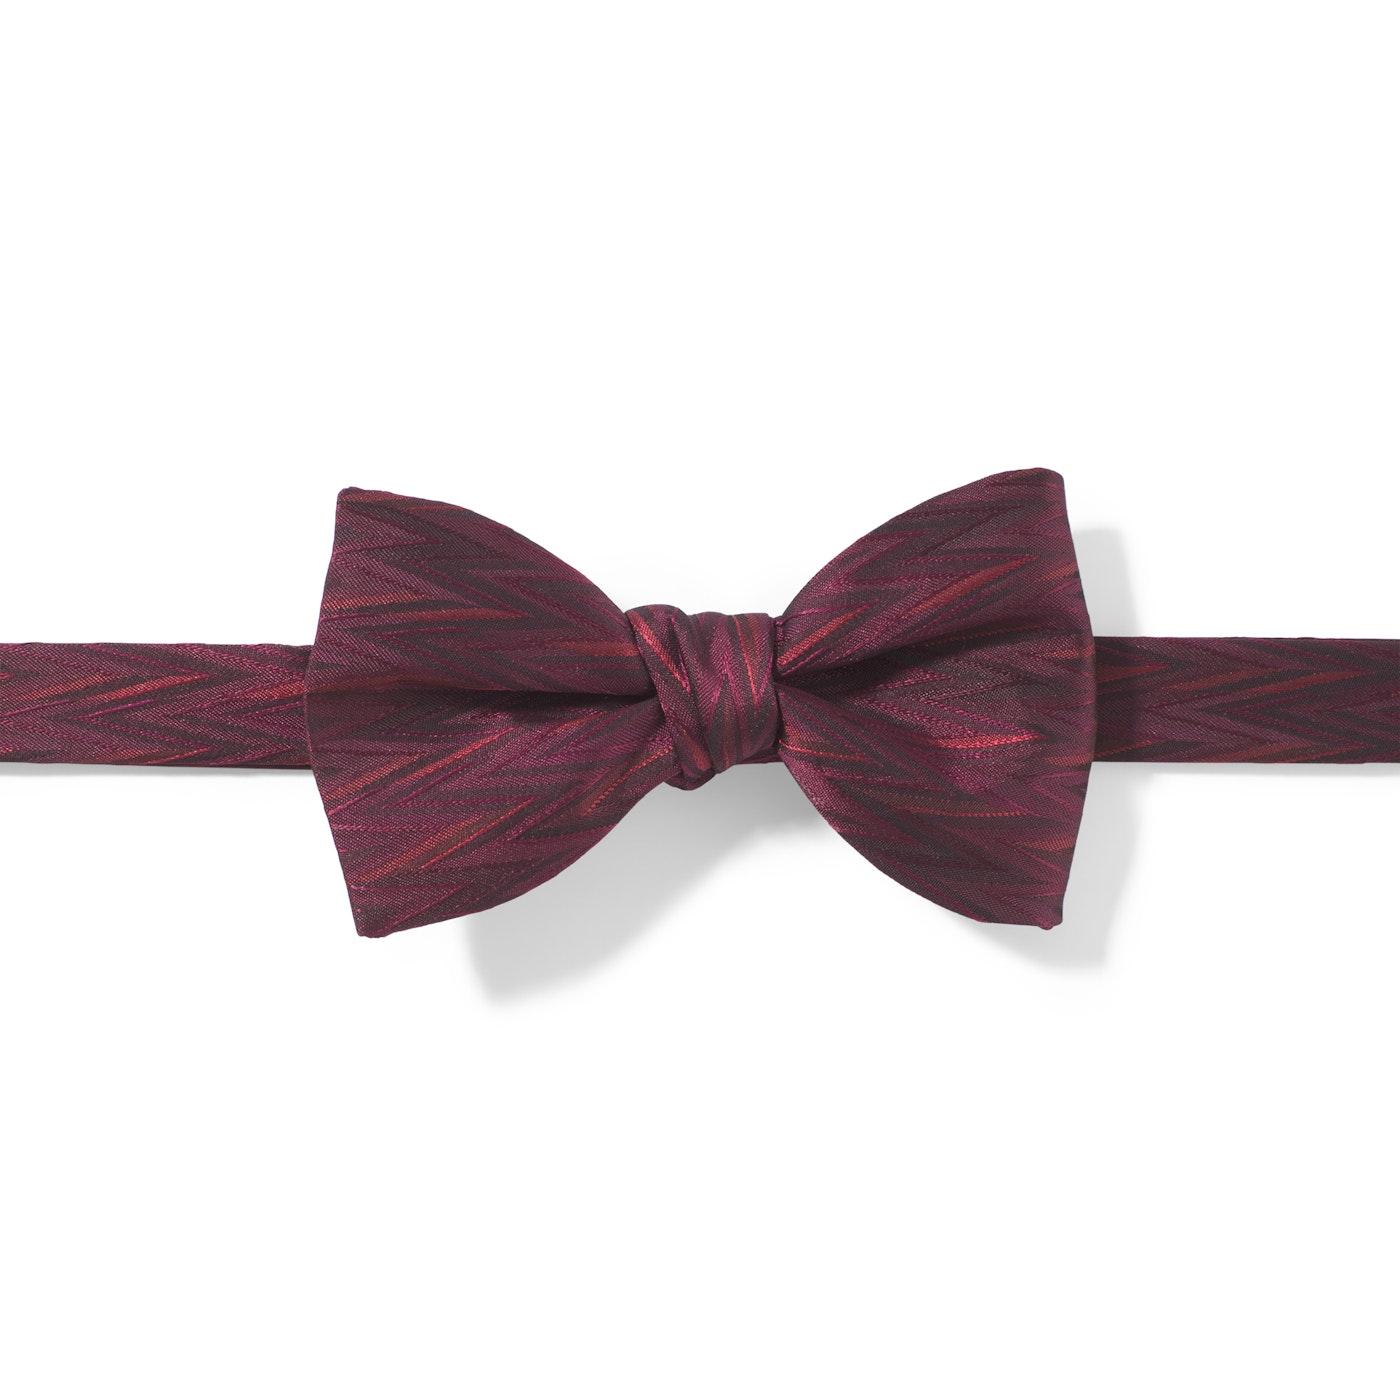 Wine-Sangria Zig Zag Pre-Tied Bow Tie